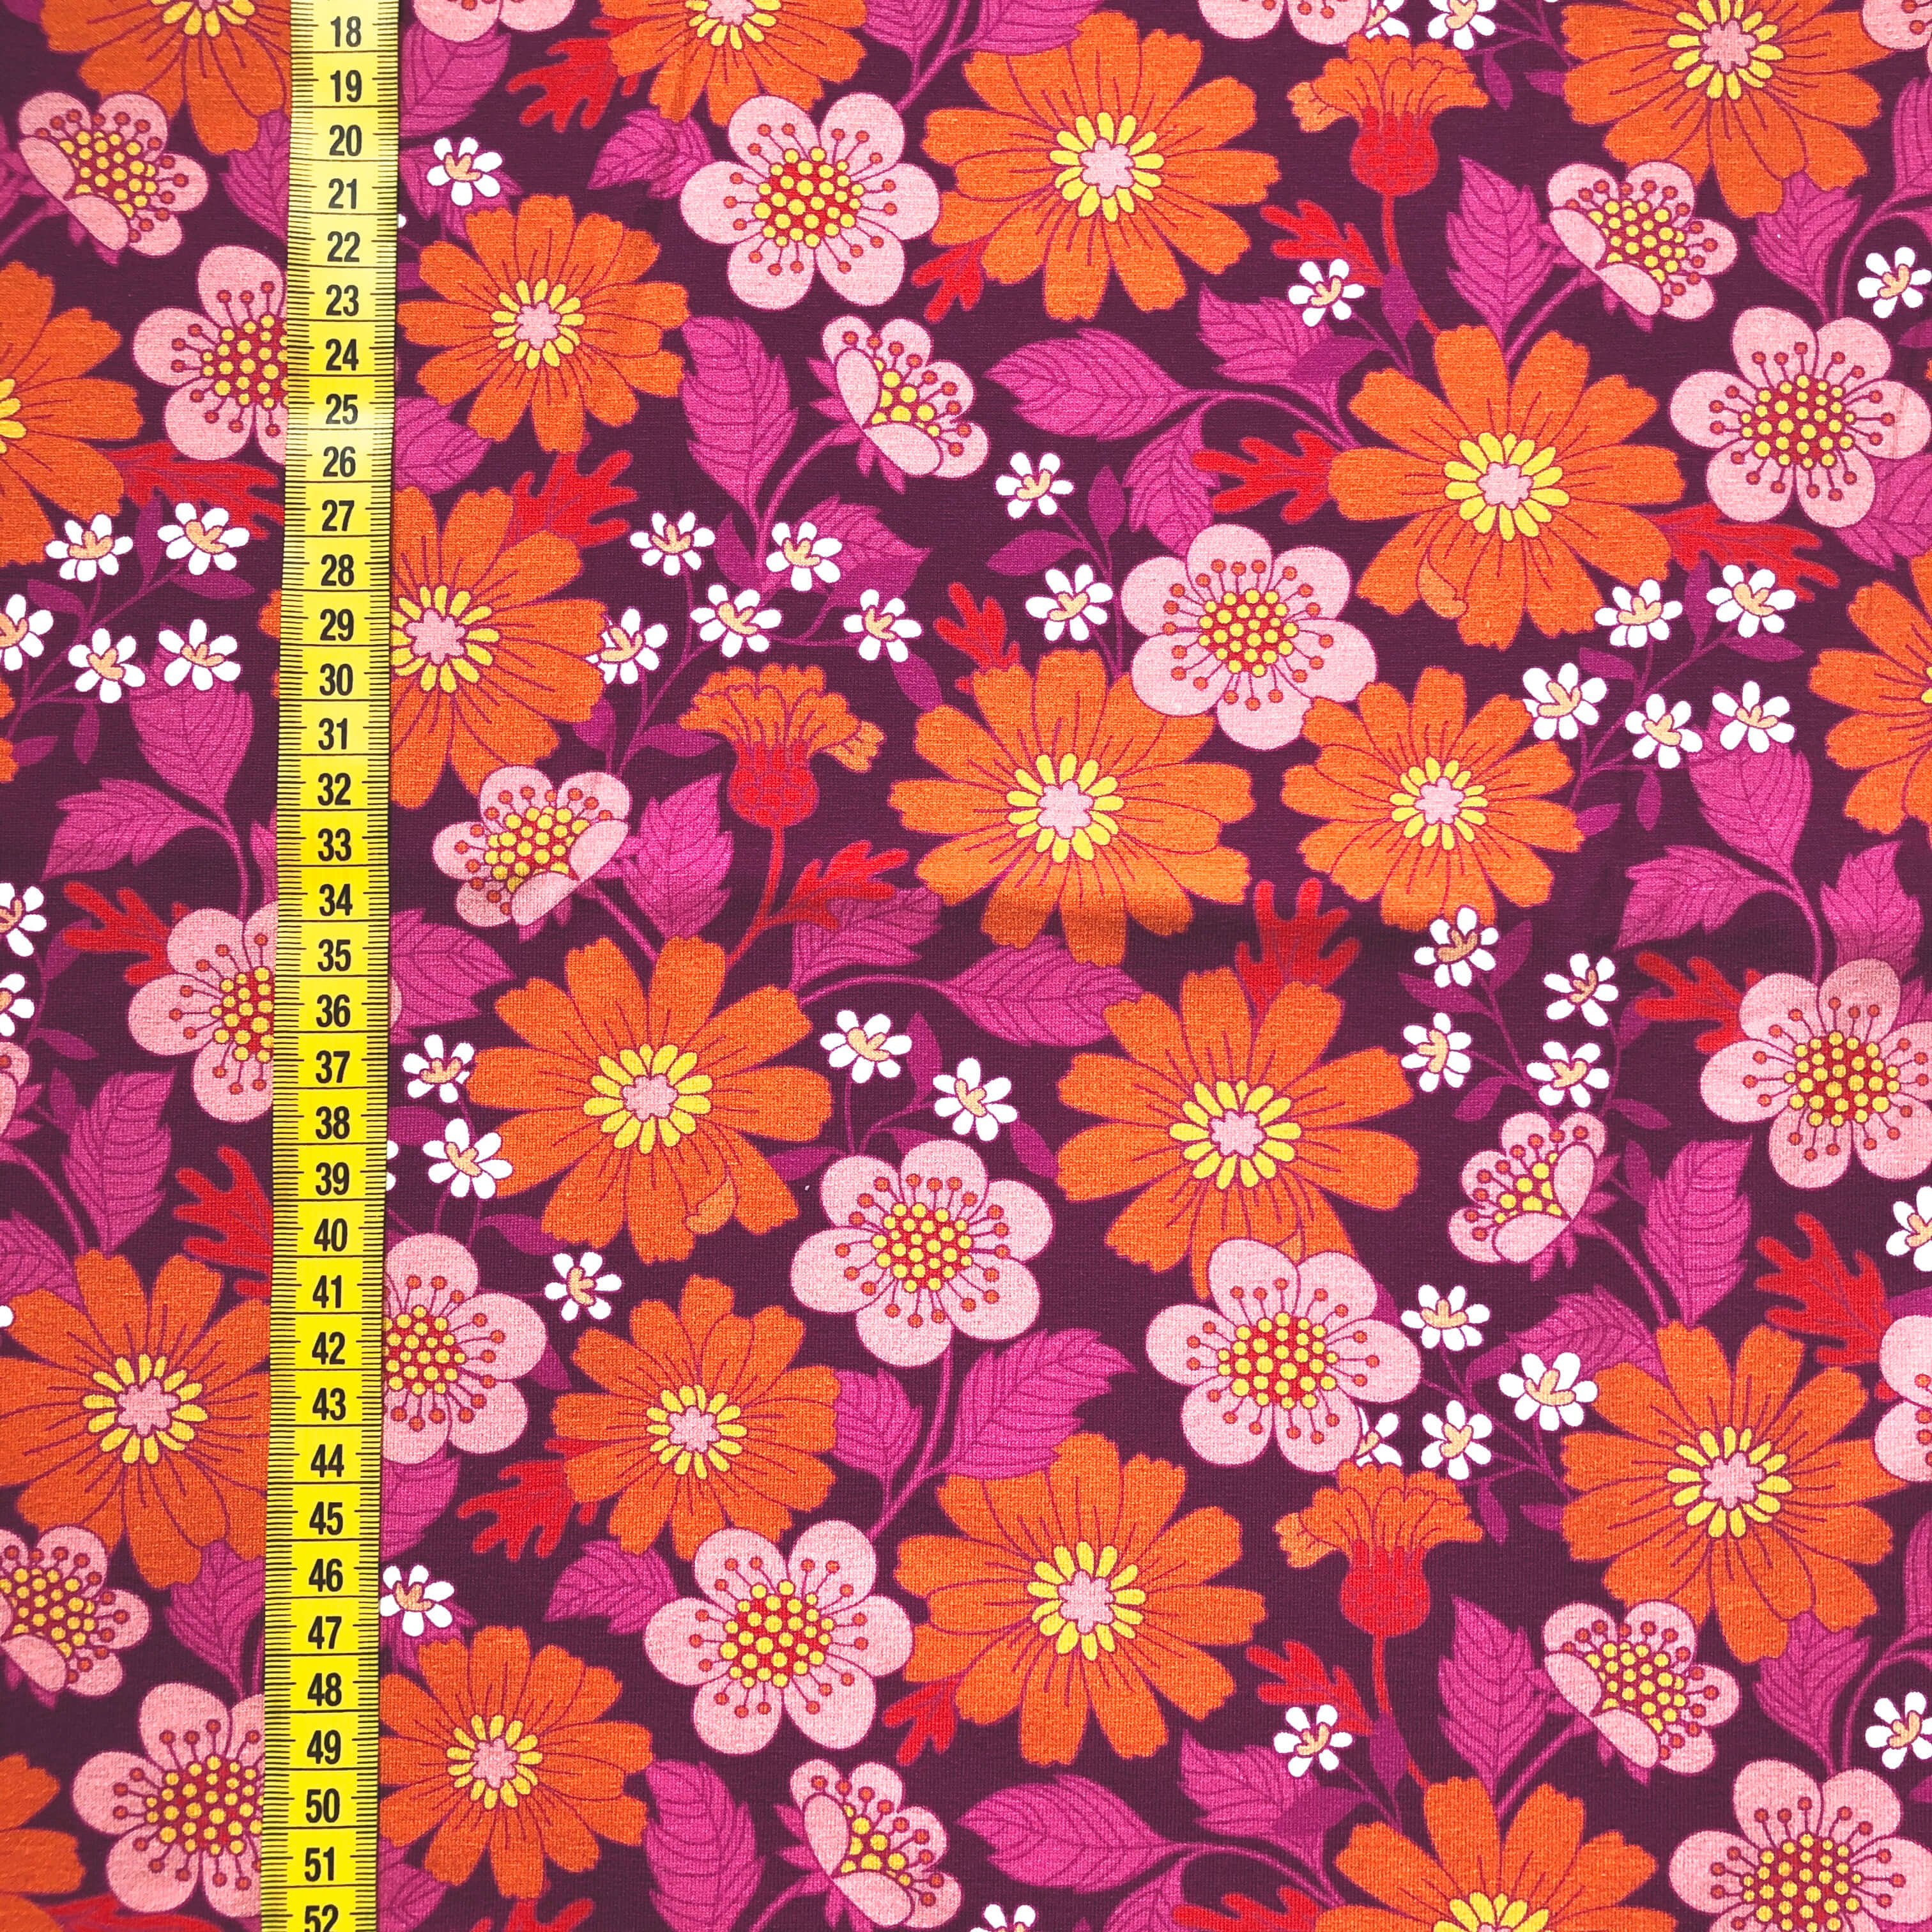 Blomster Florens, Cerise #608, eko,gots